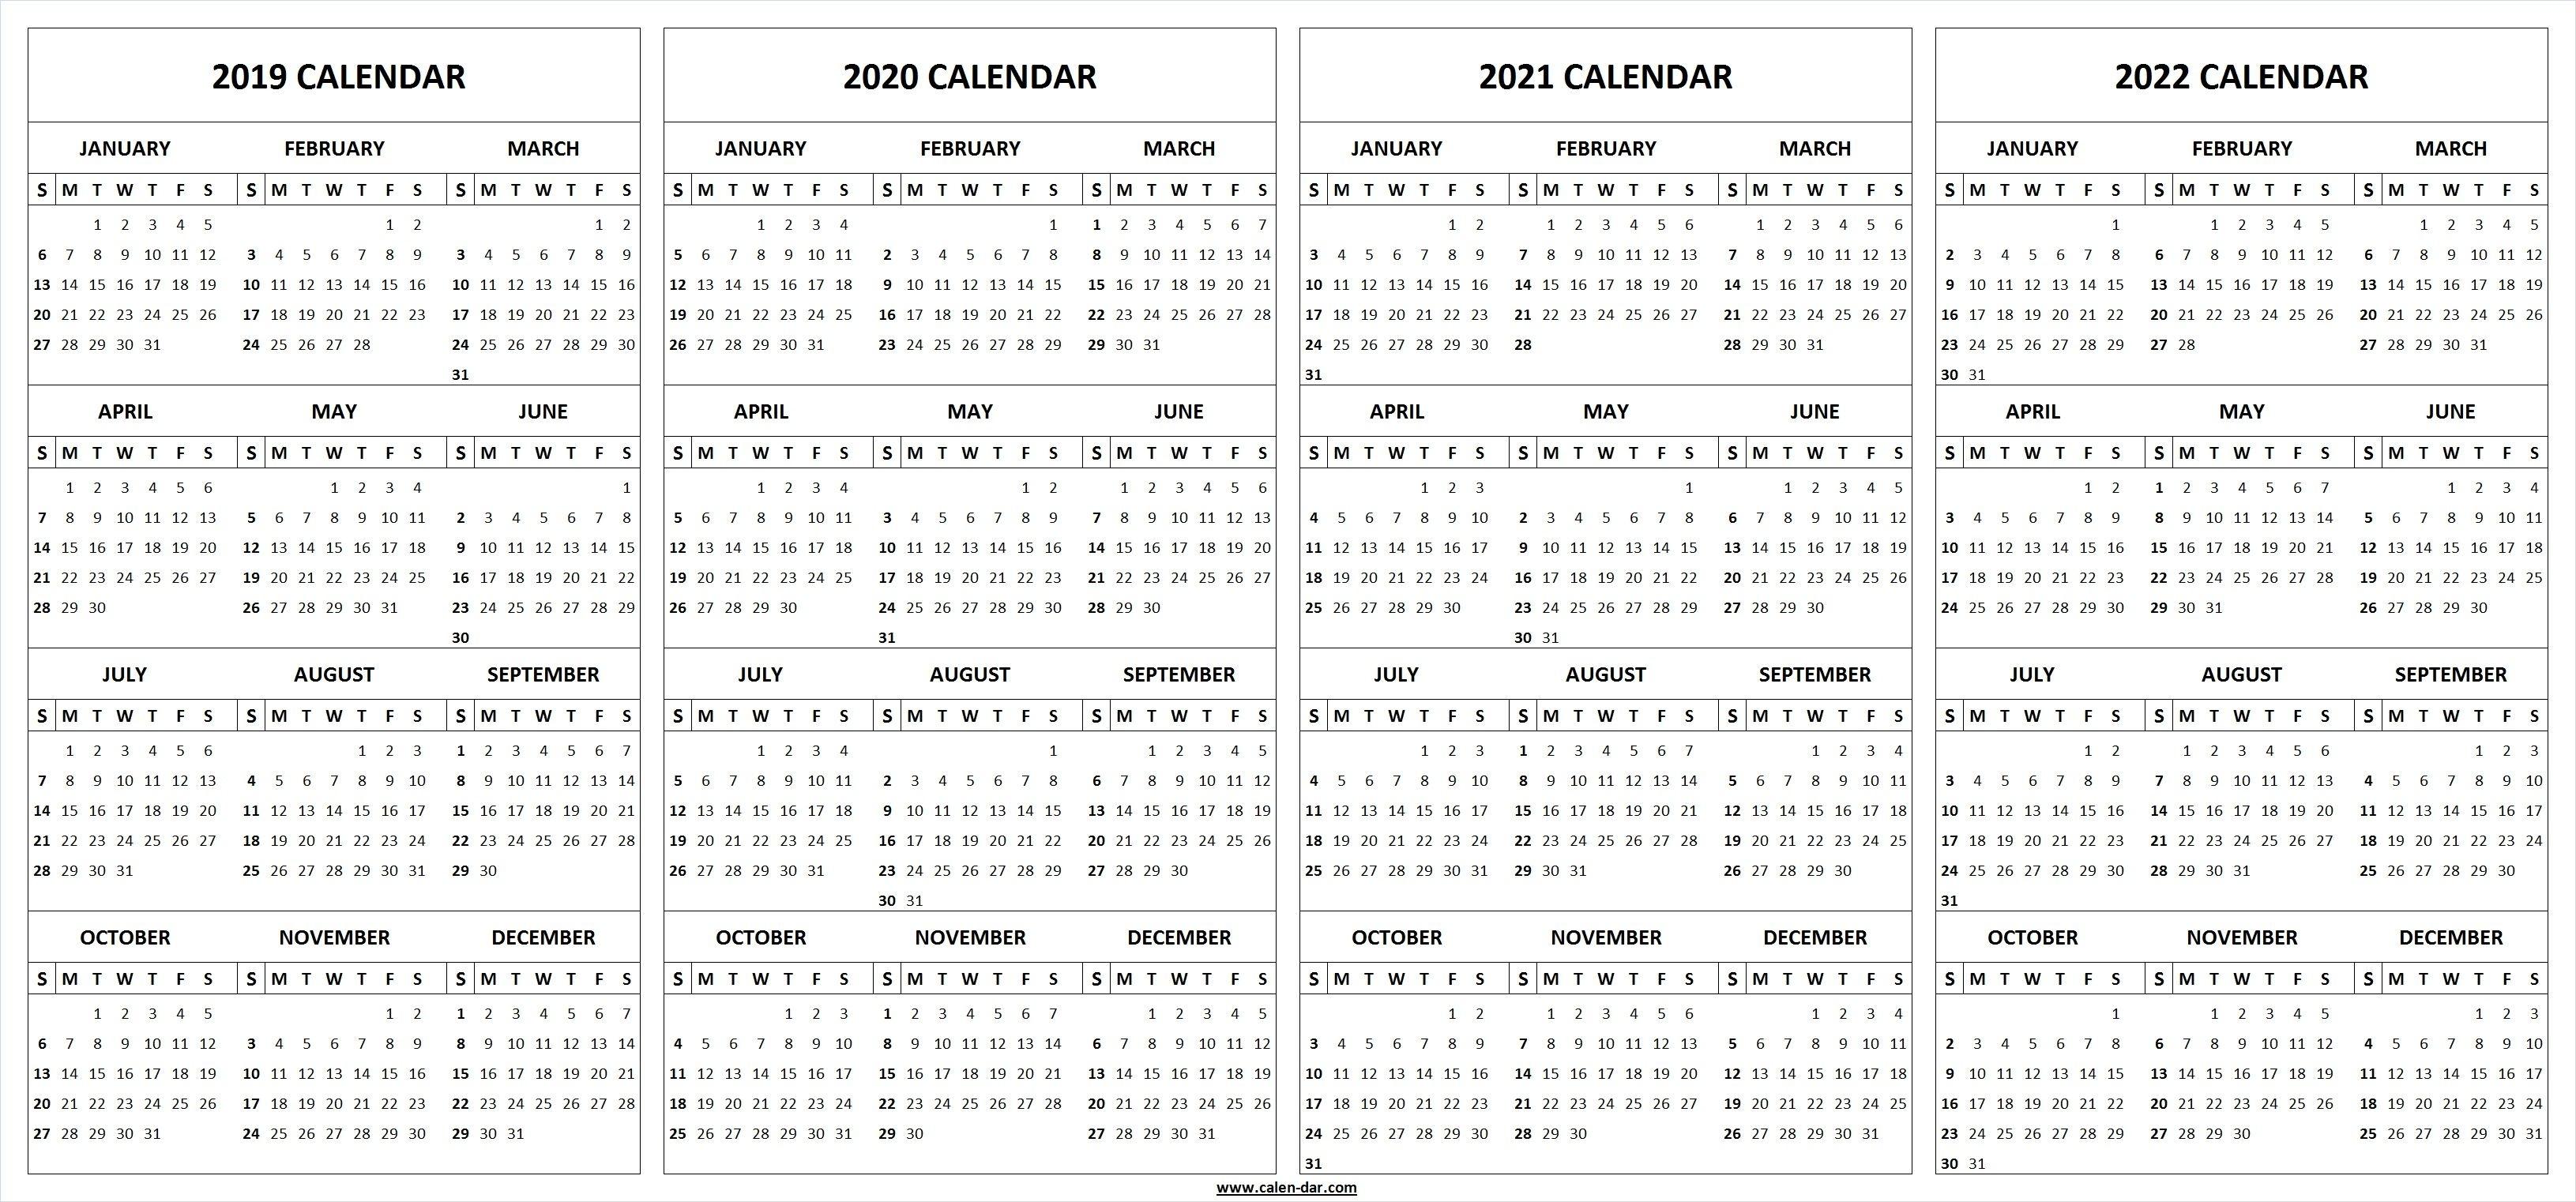 2019 2020 2021 2022 Calendar Blank Template | 2021 Calendar throughout 2020 - 2022 Printable Calendar